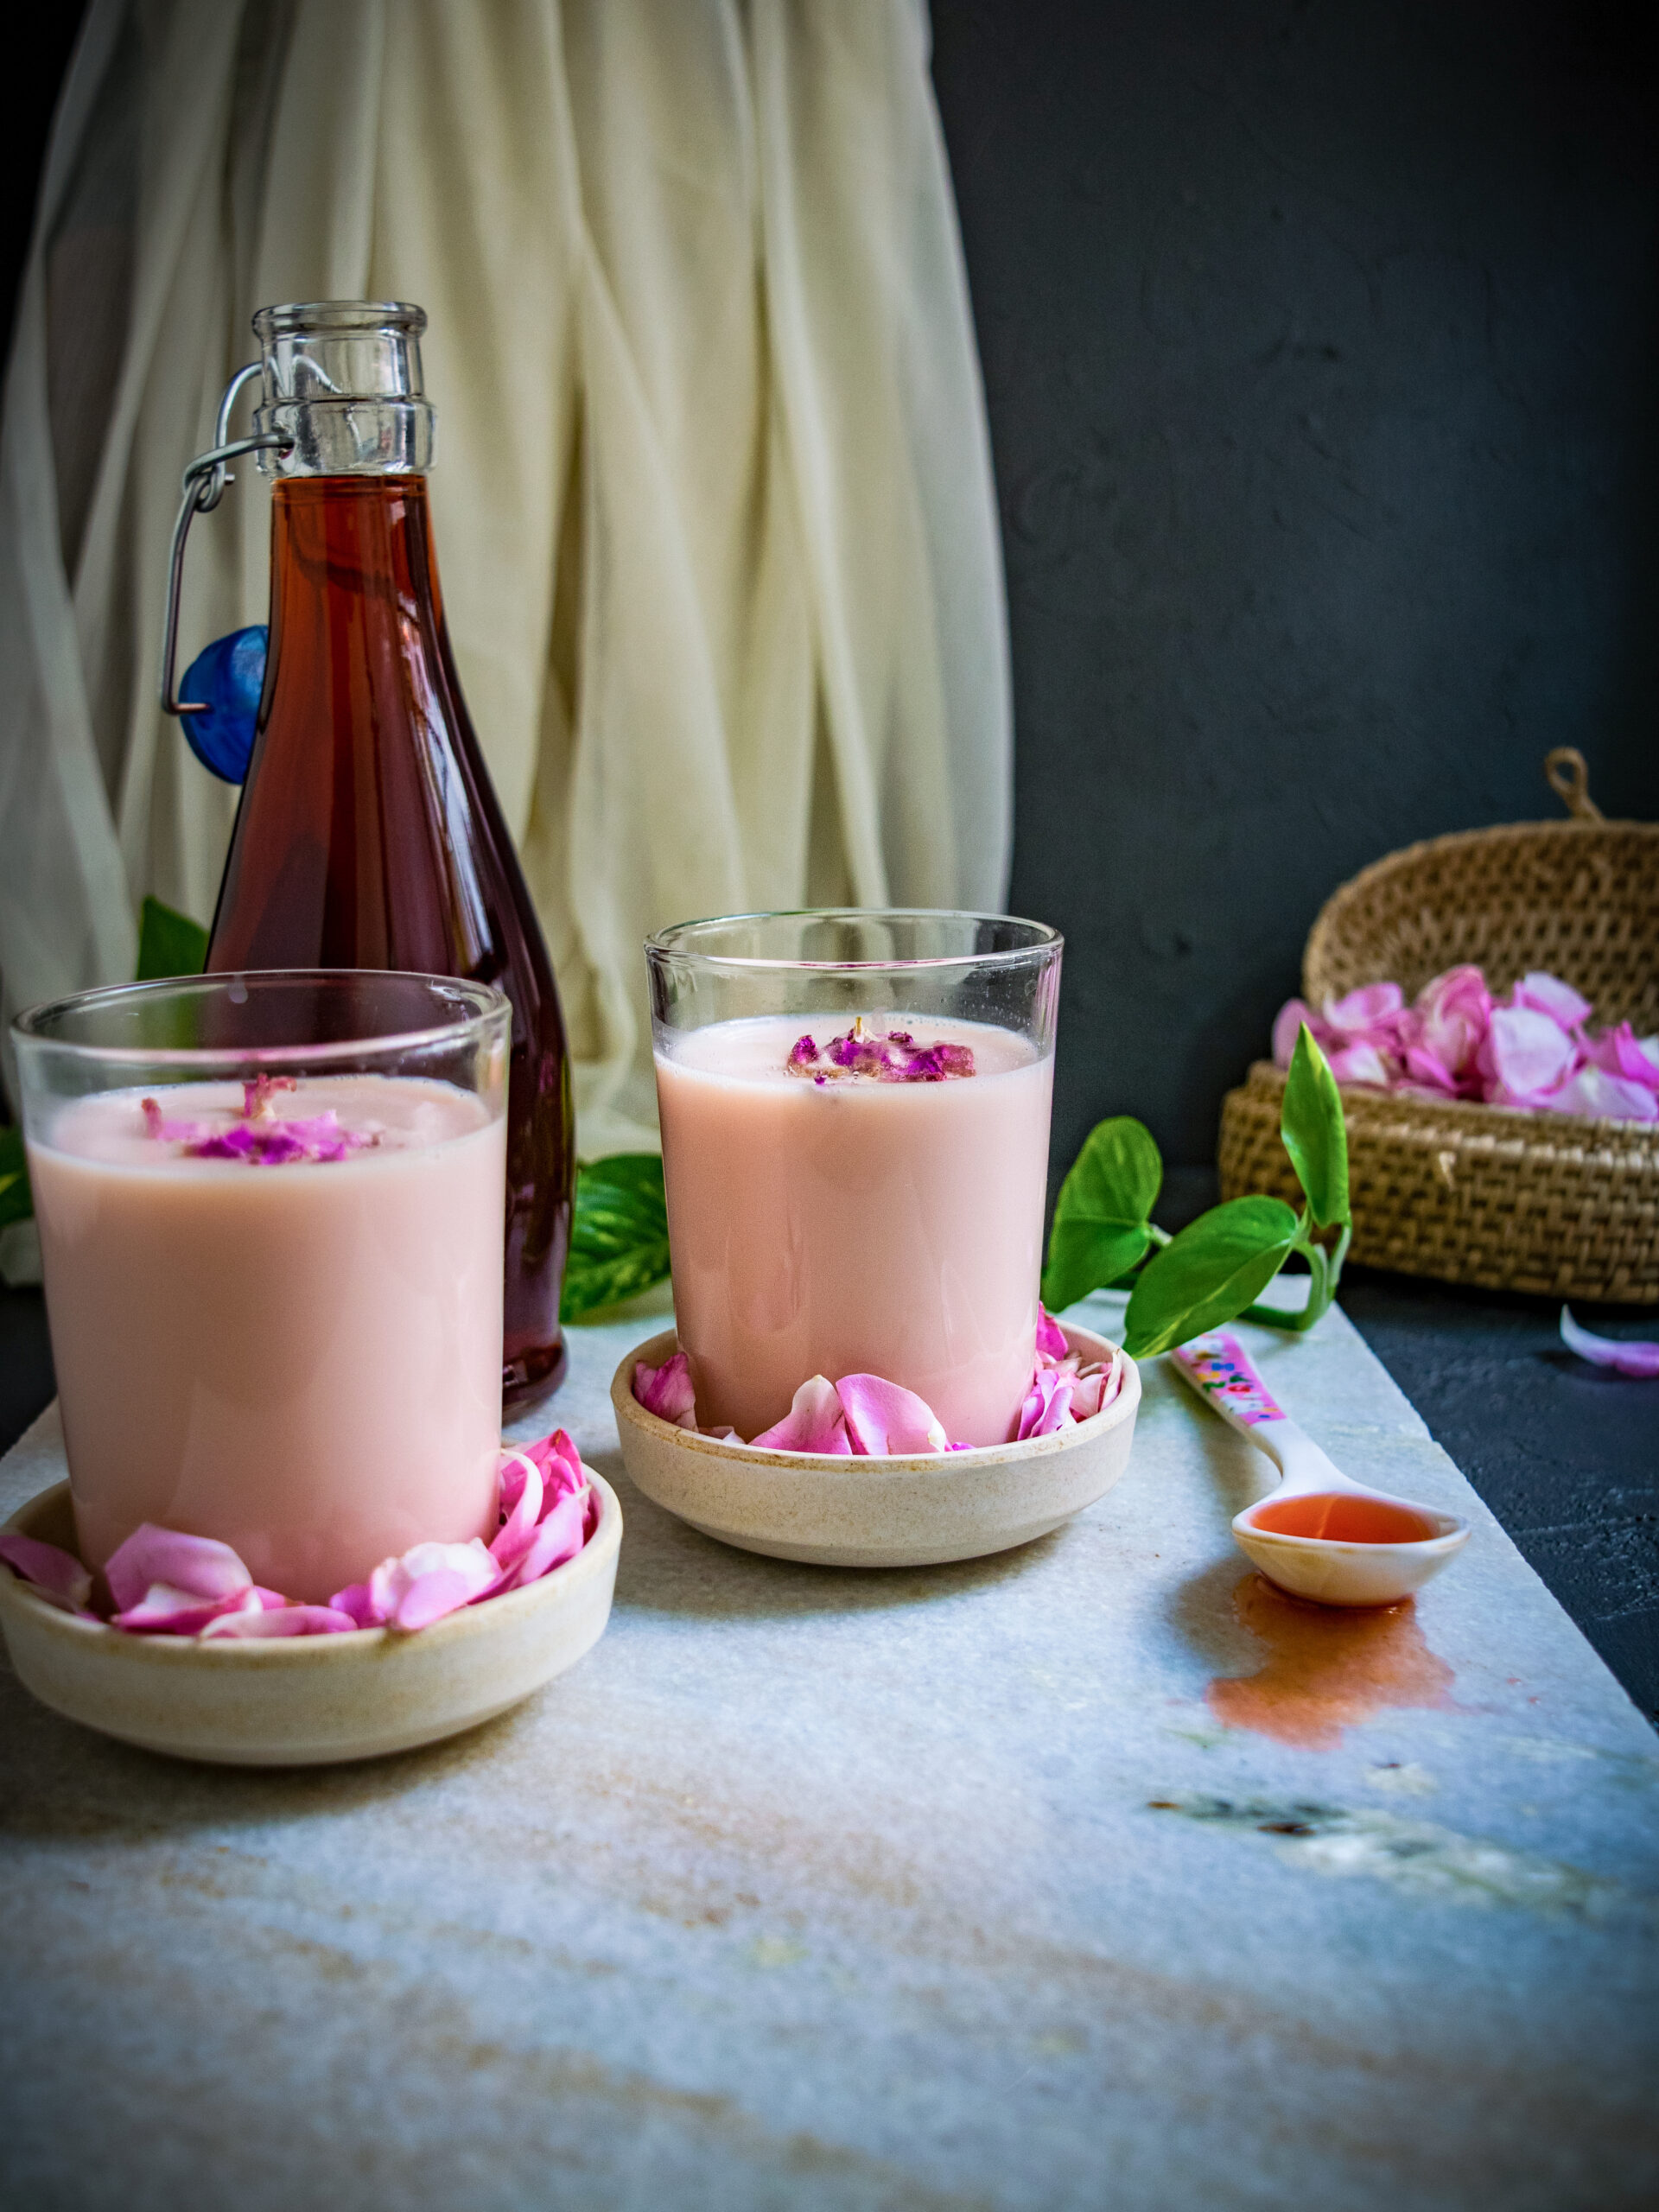 rose milk using homemade syrup